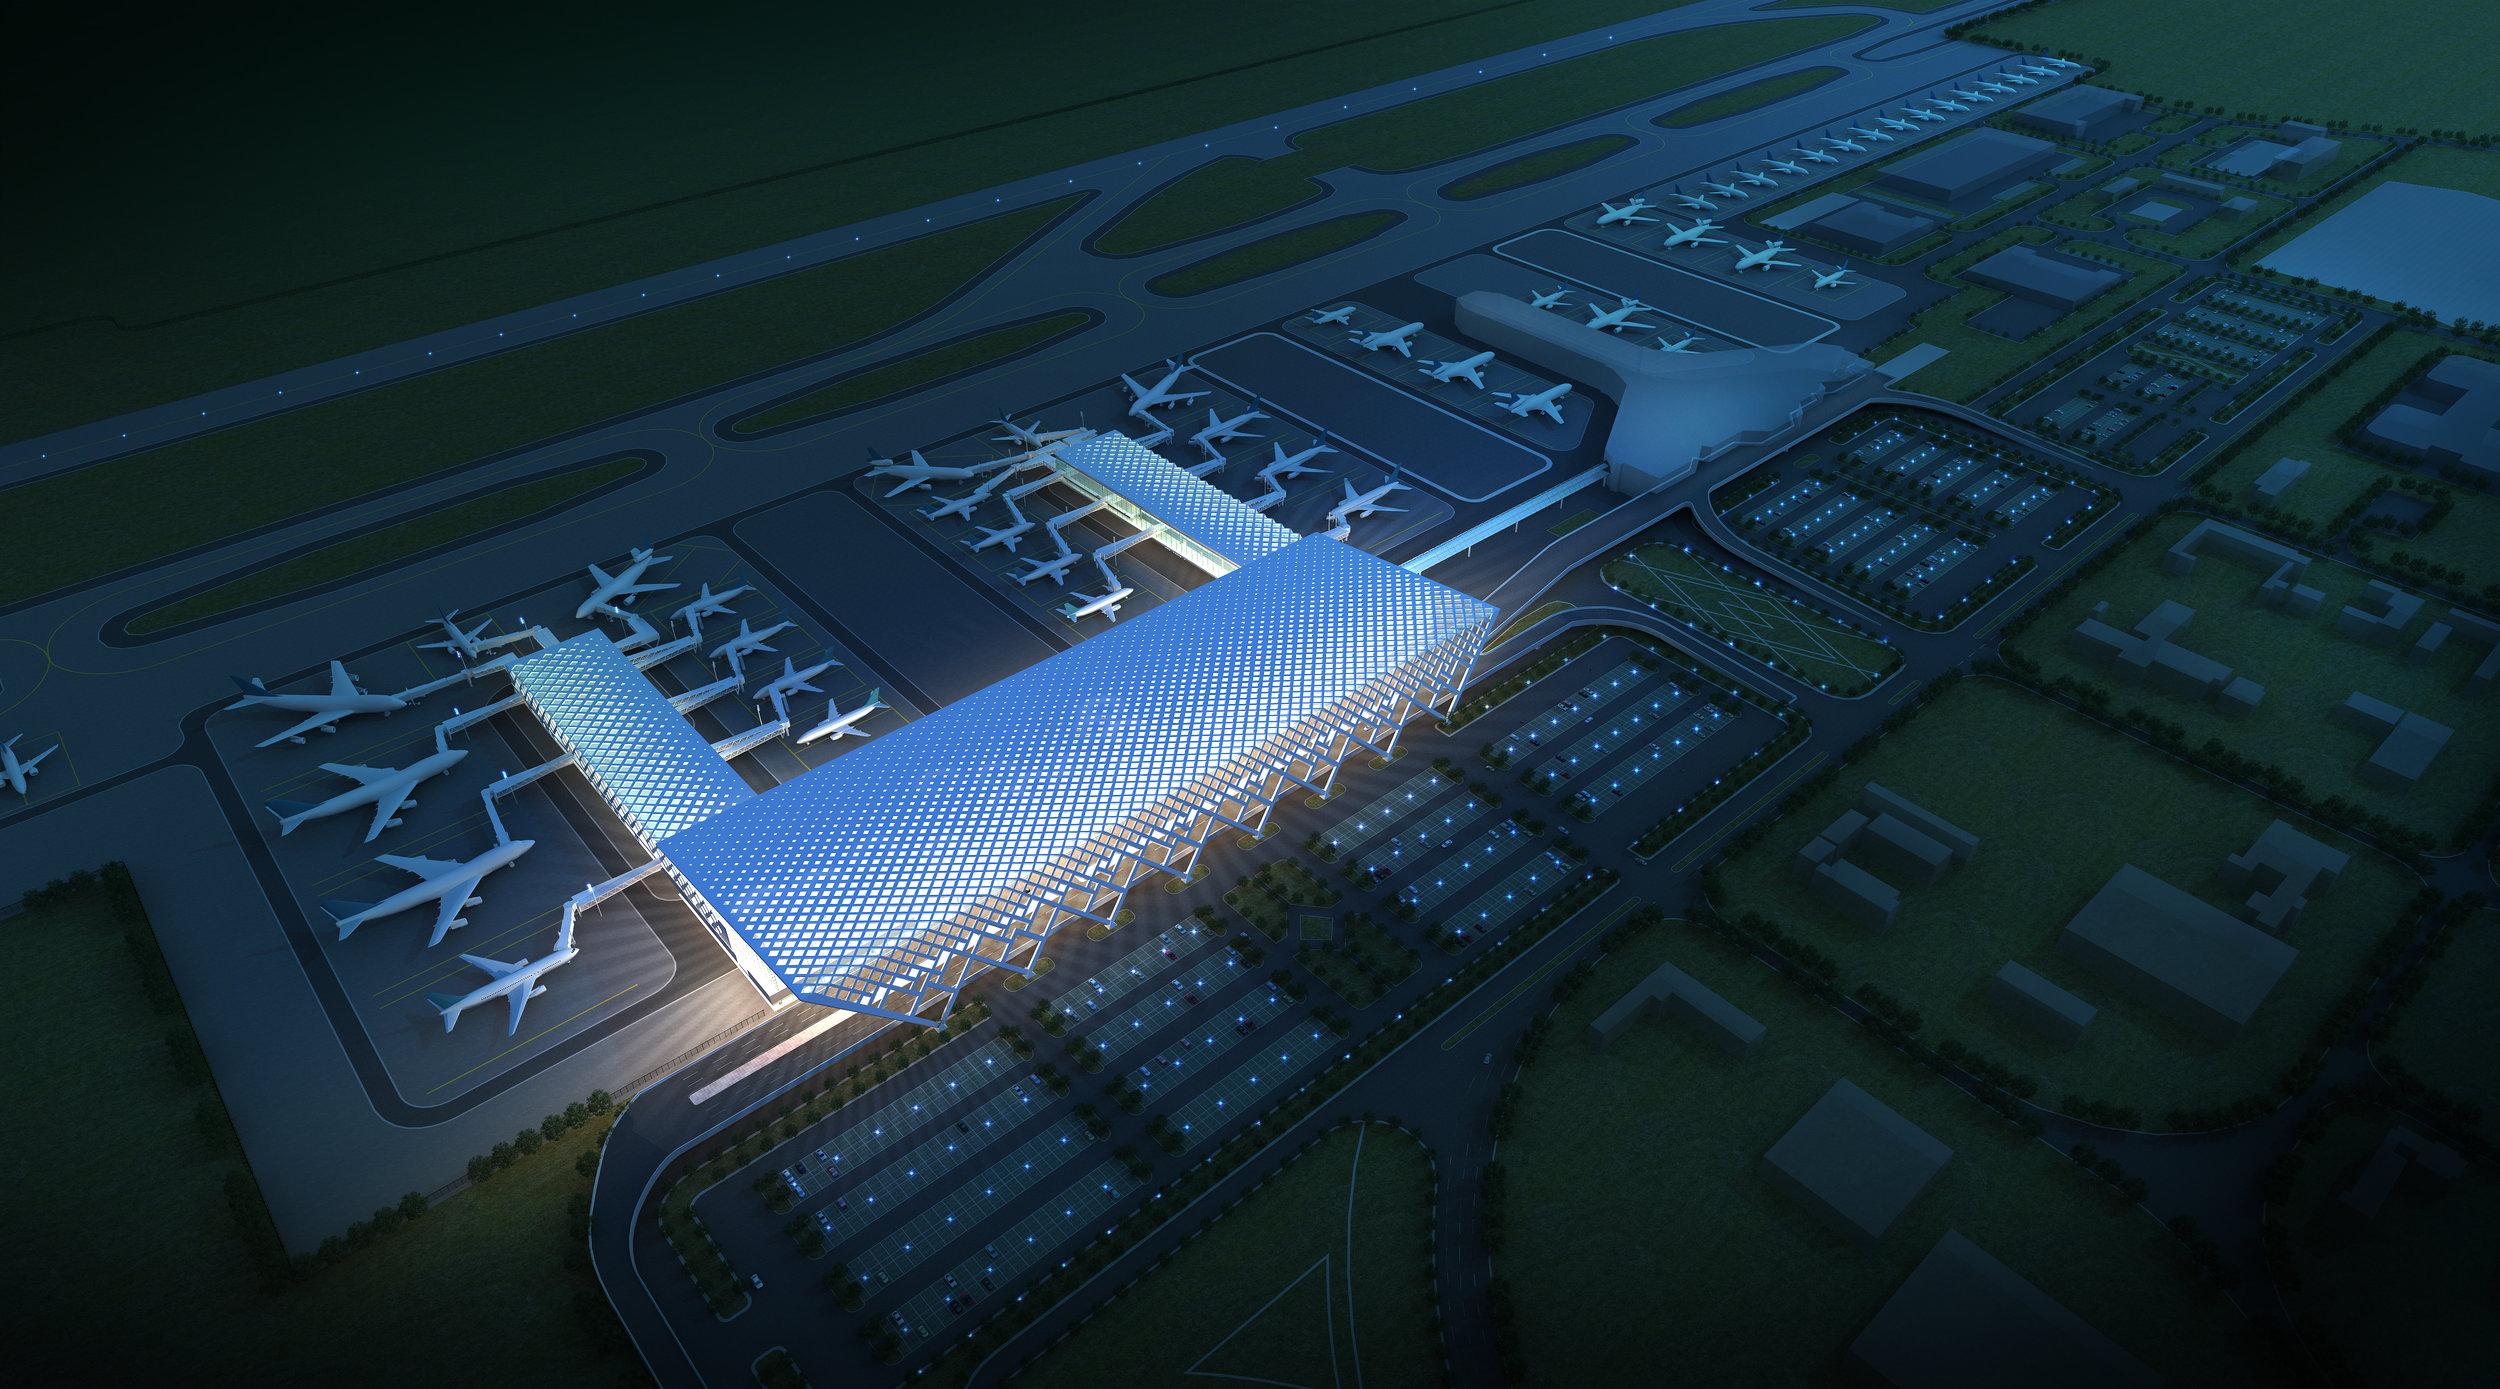 Longdongbao Int'l Airport<br>龍洞堡國際機場